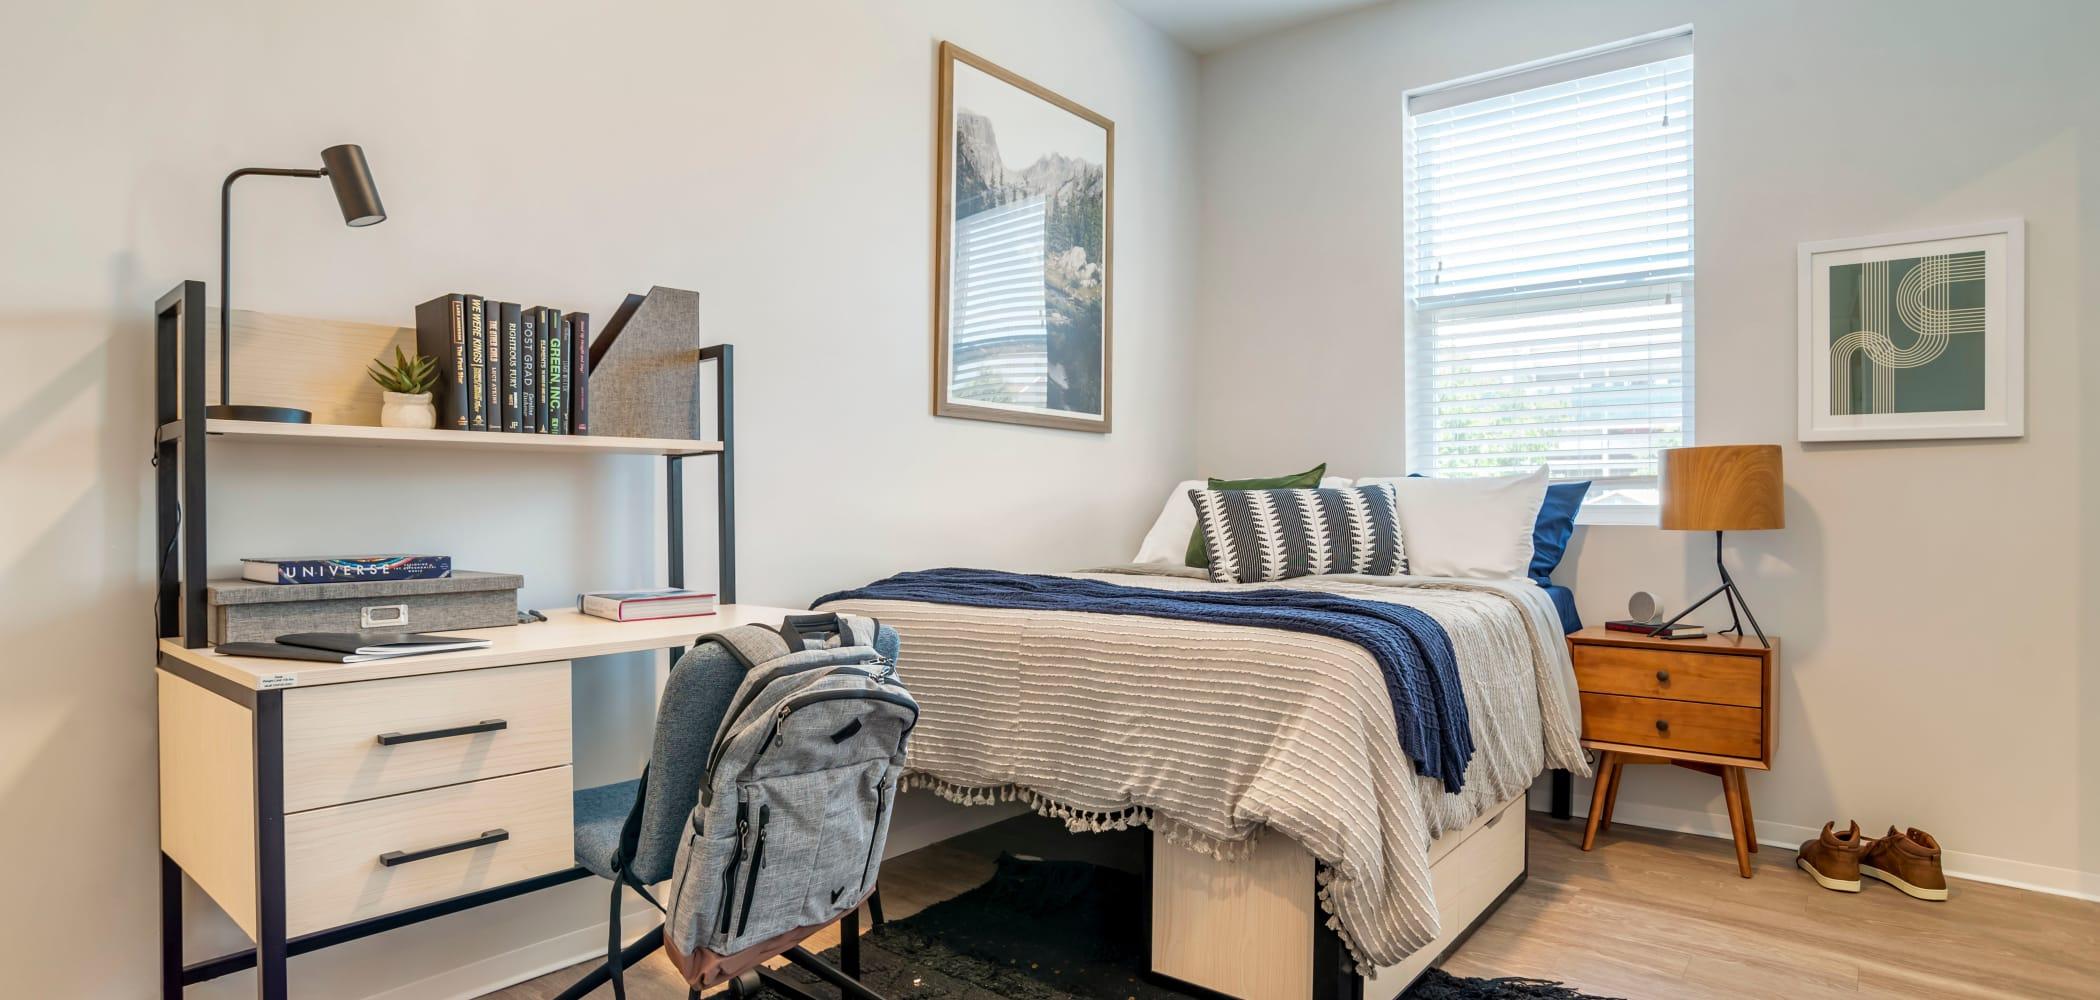 Fully furnished living spaces  UNCOMMON Tuscaloosa in Tuscaloosa, Alabama